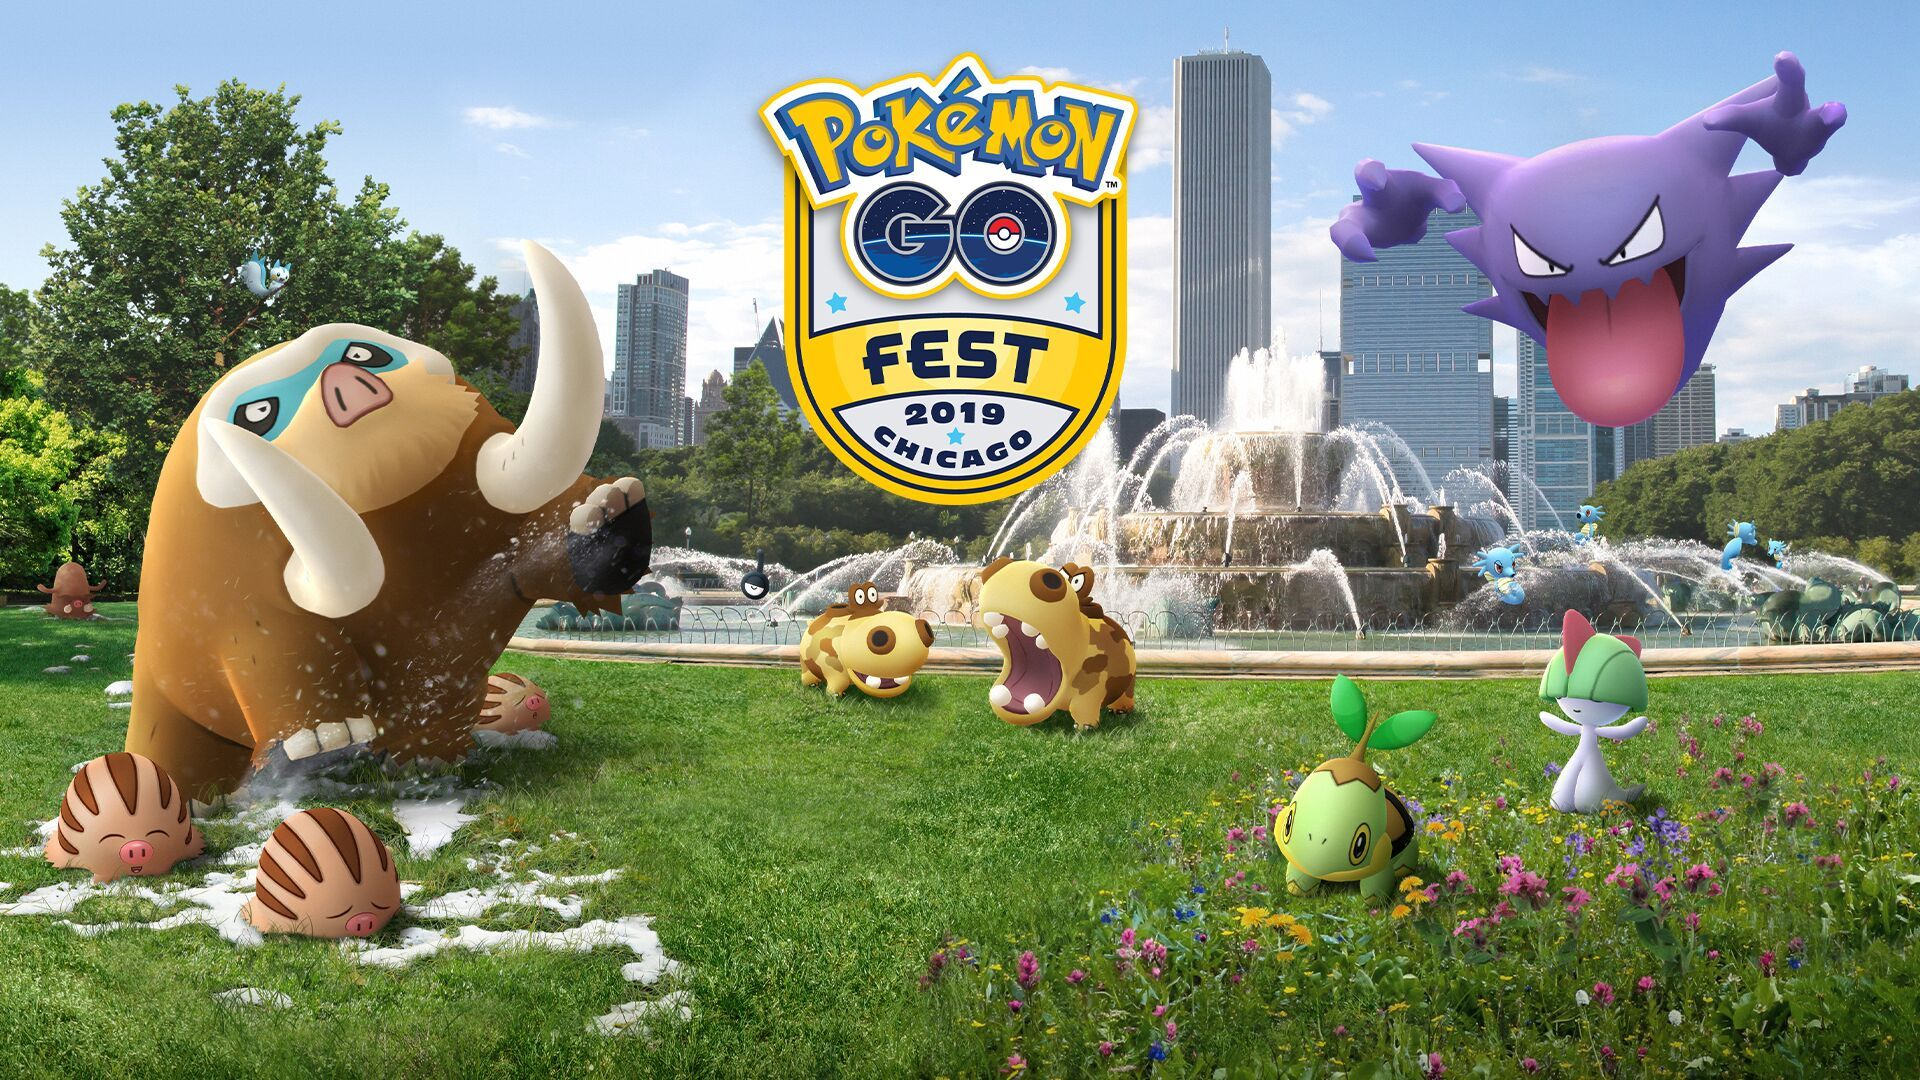 pokemon go fest chicago 2019 image logo pachirisu gallade shiny horsea